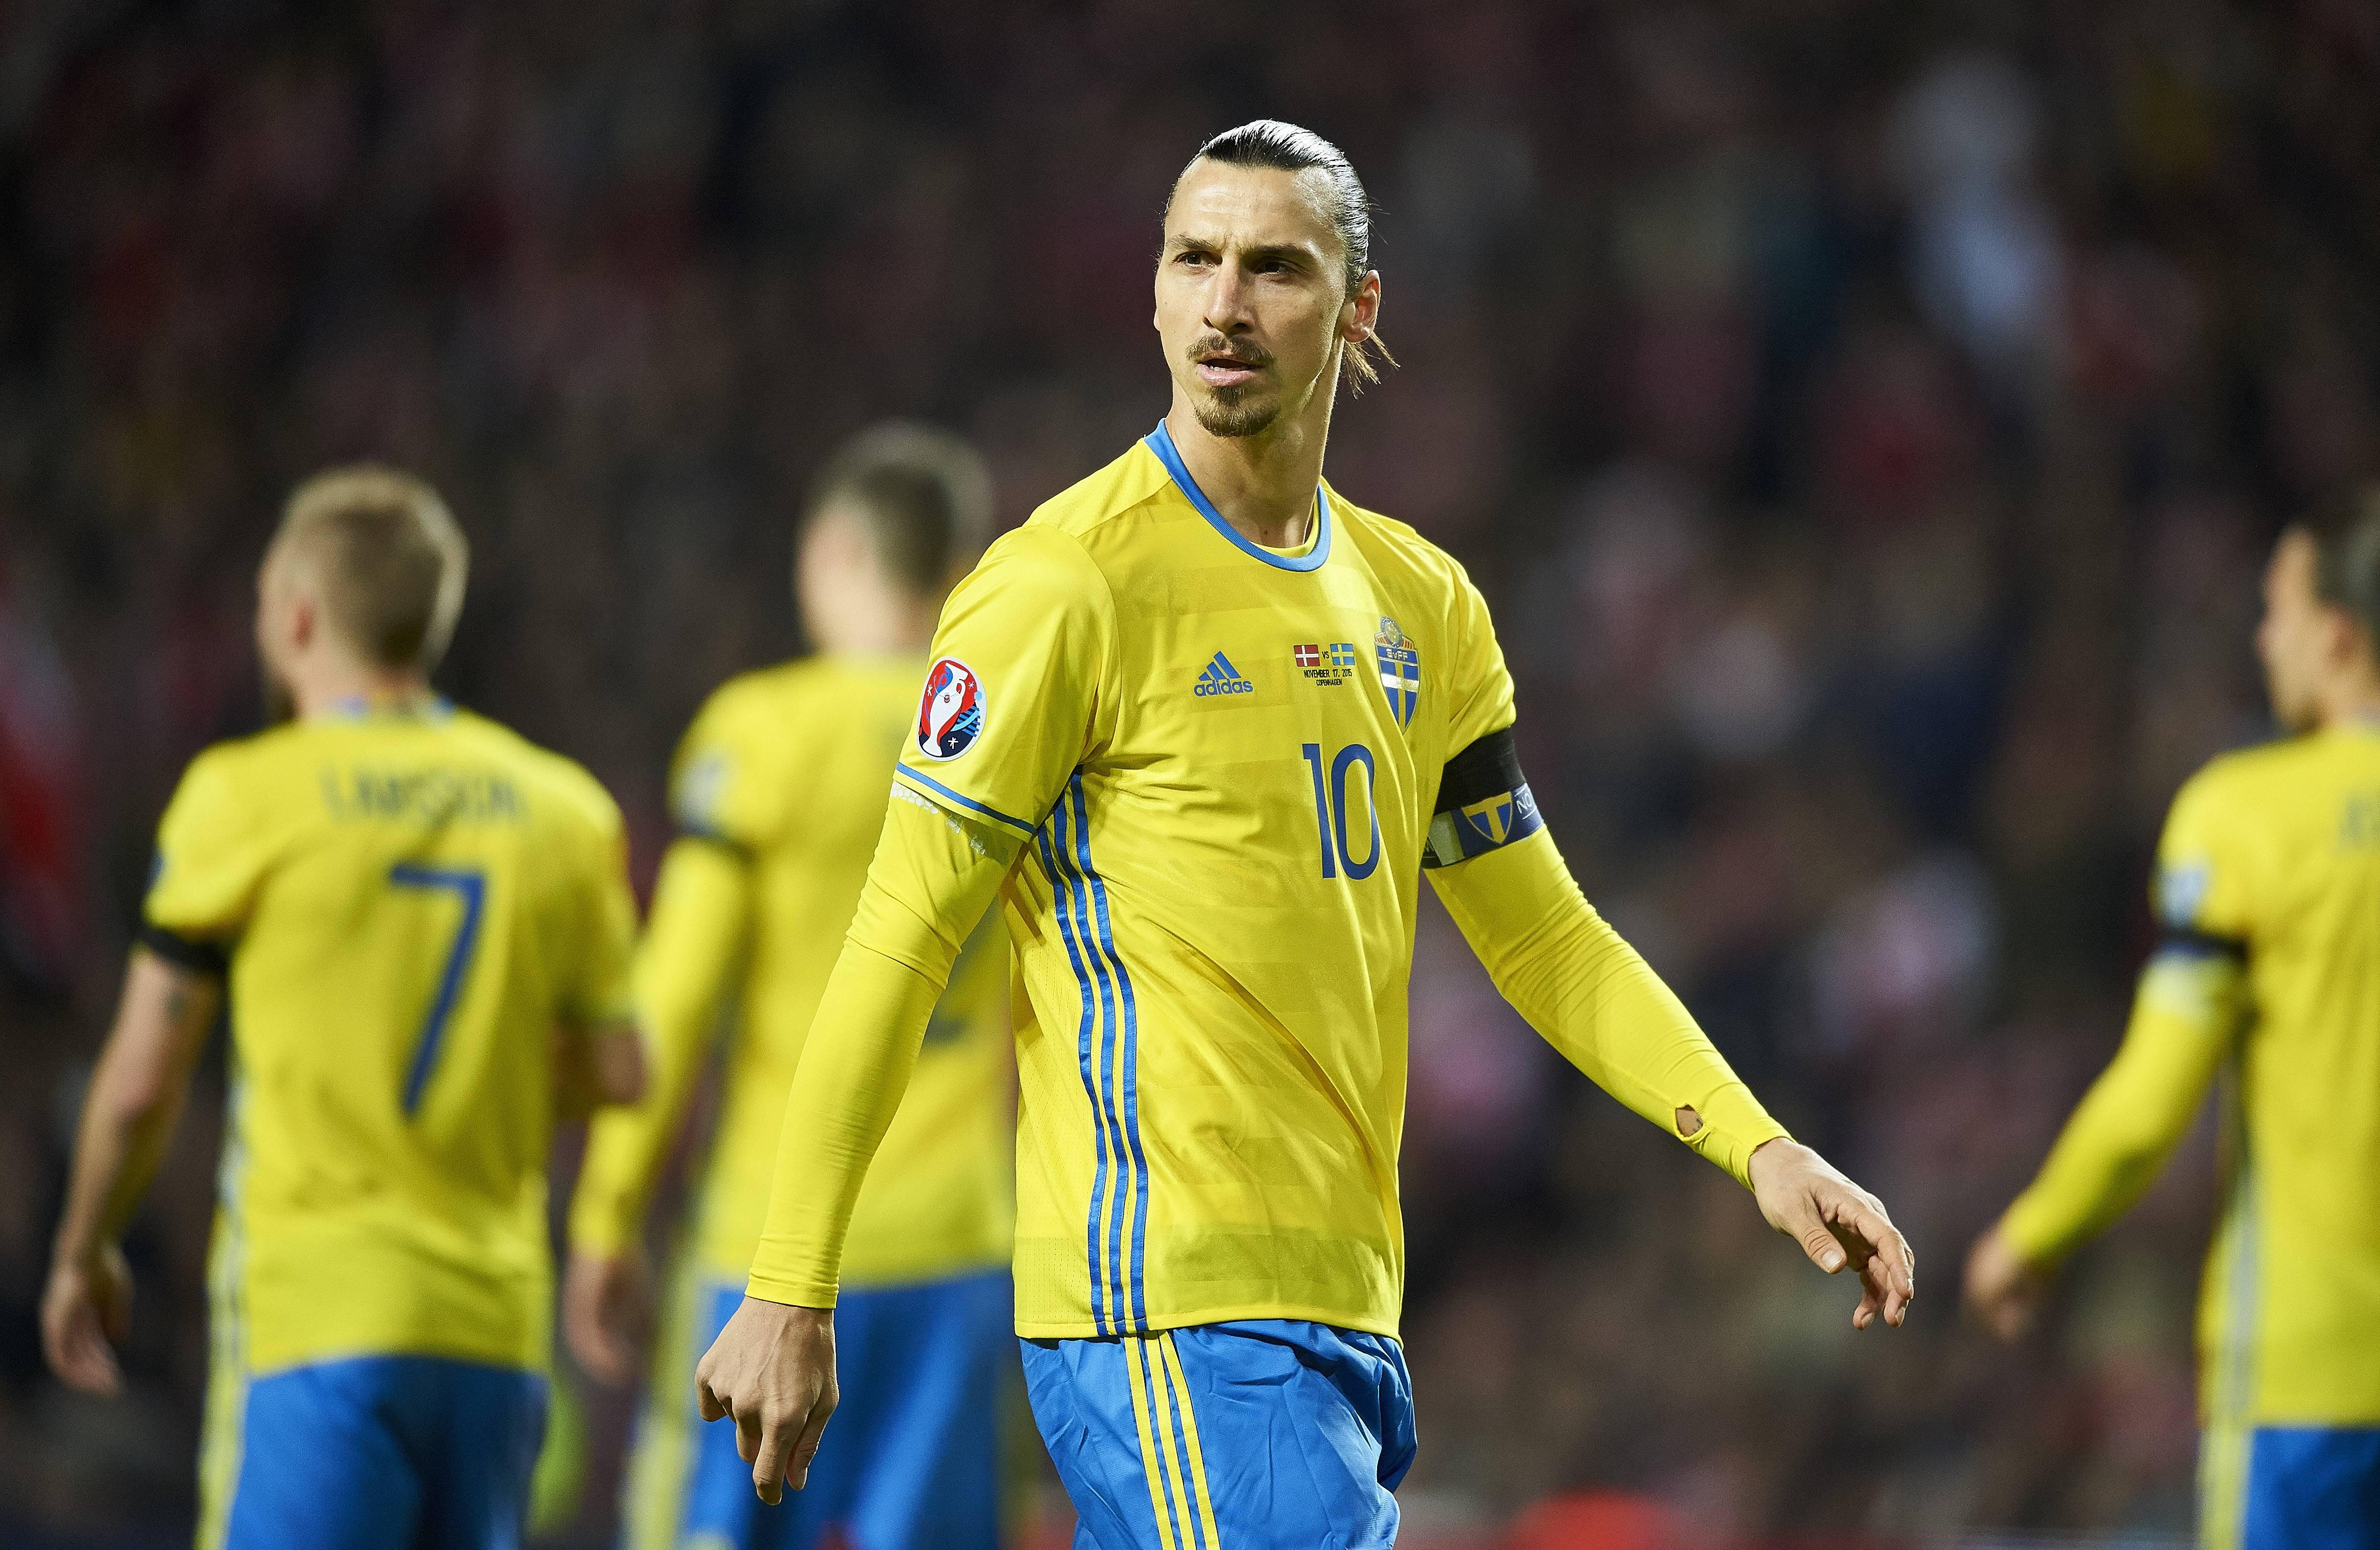 """Who is 즐라탄?"" 즐라탄의 은퇴 후 스웨덴이 달성한 것들"